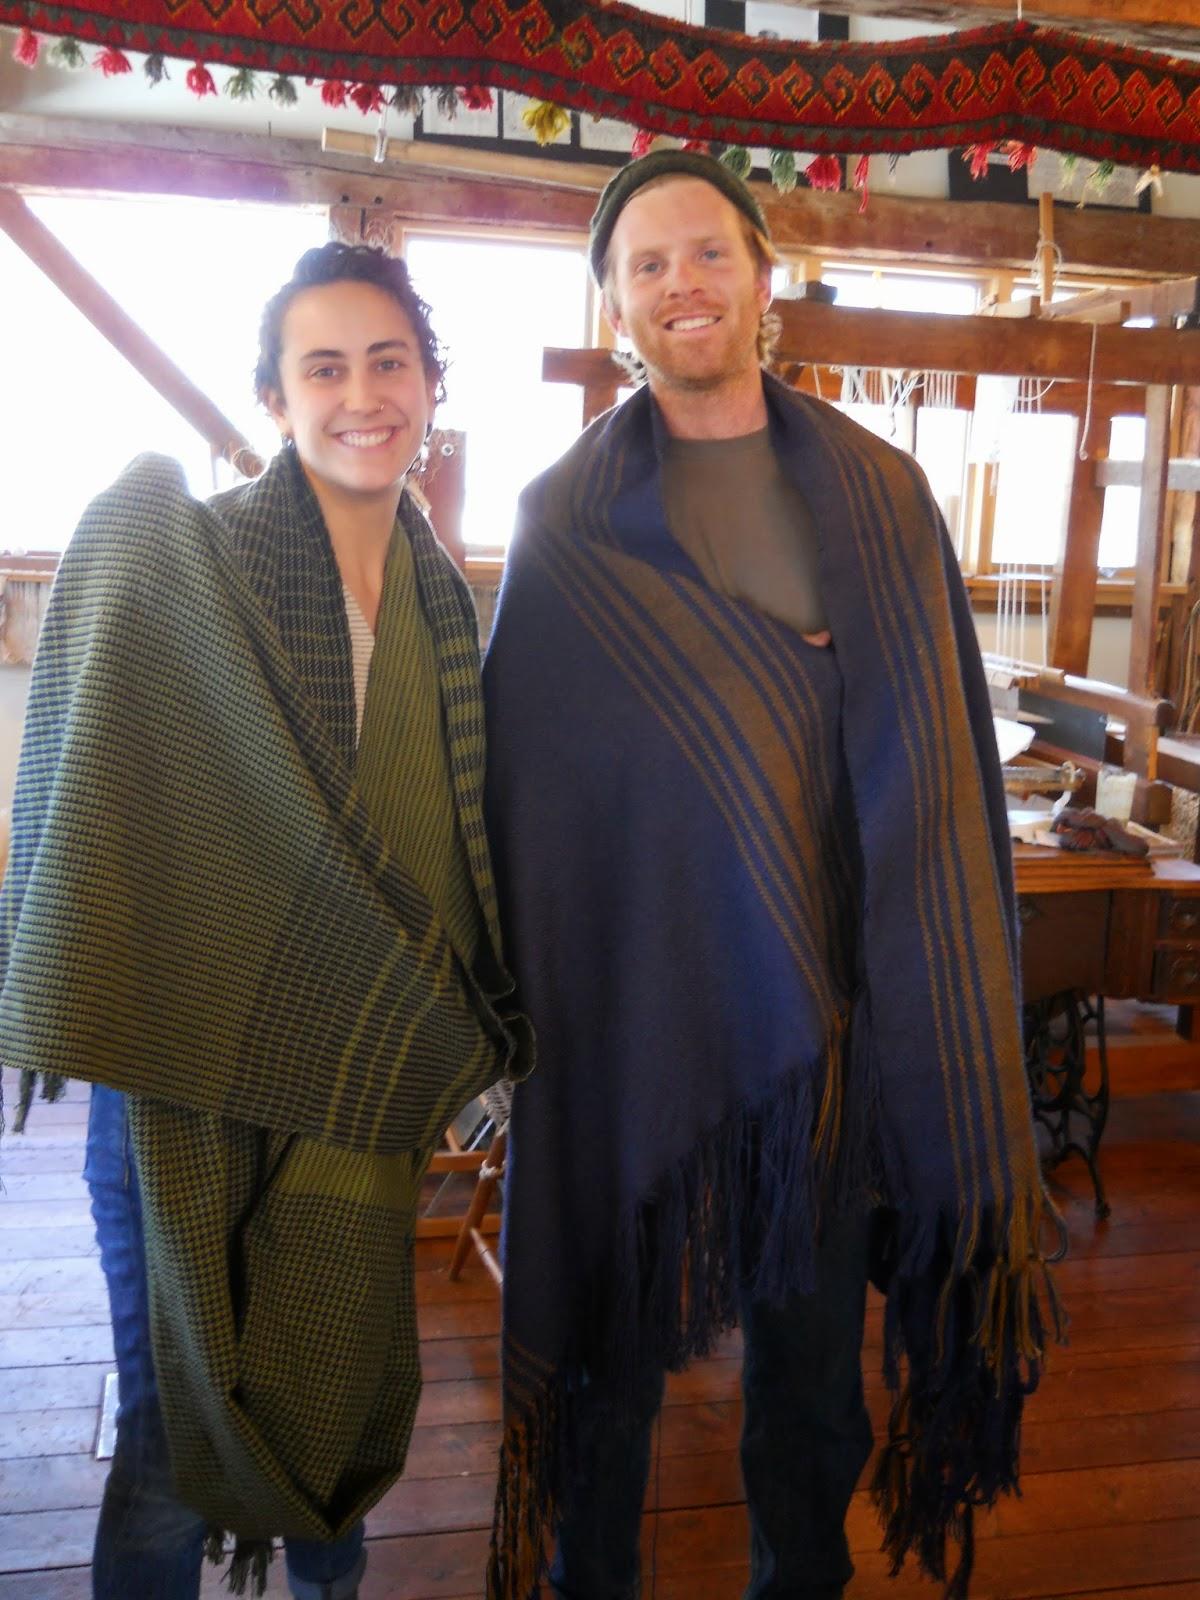 Marshfield School Of Weaving December 2013